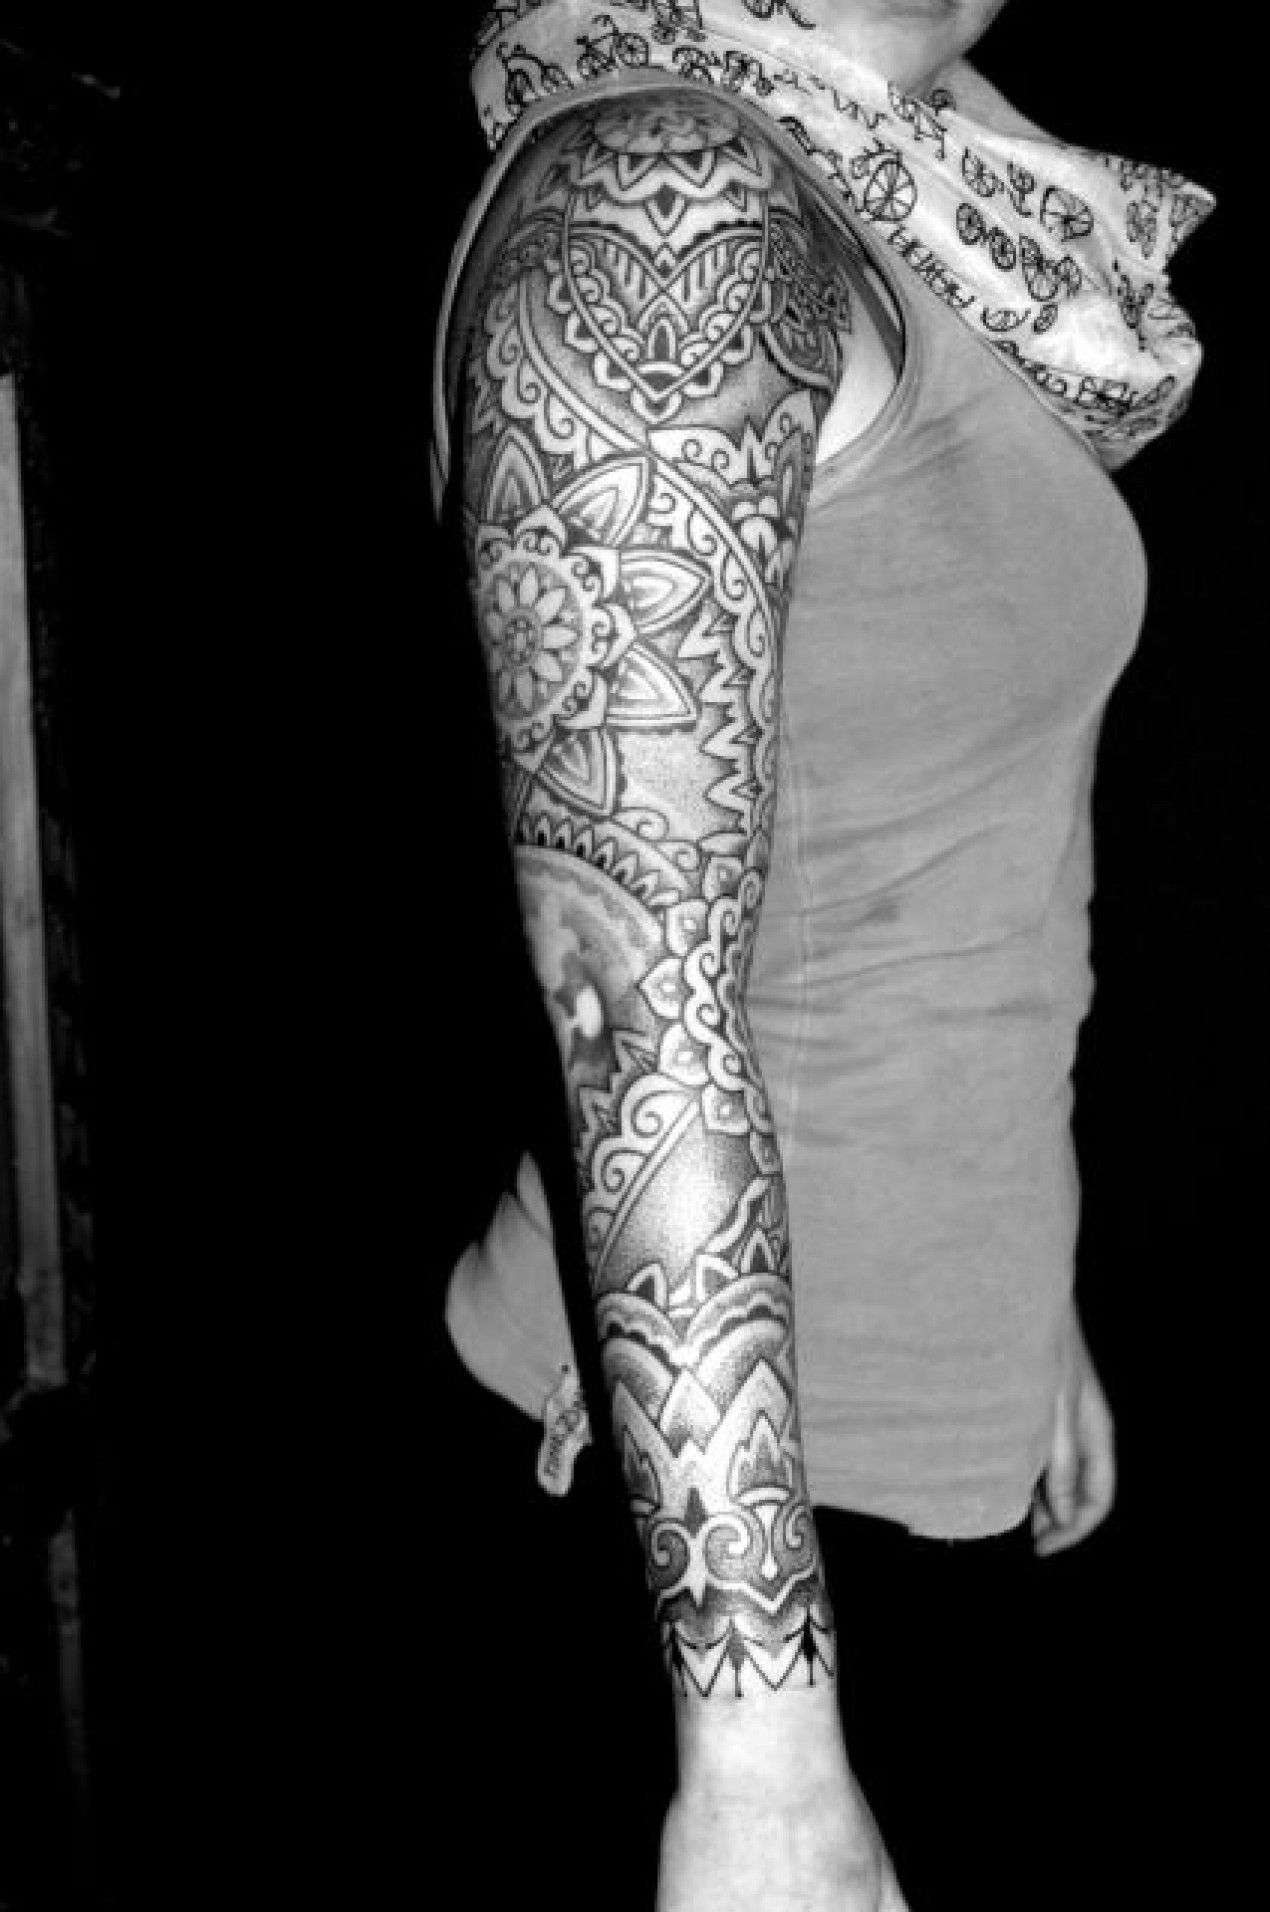 Tatouage mandala bras tatouage tribal tad pinterest tattoo tatoo and tatting - Tatouage mandala bras ...